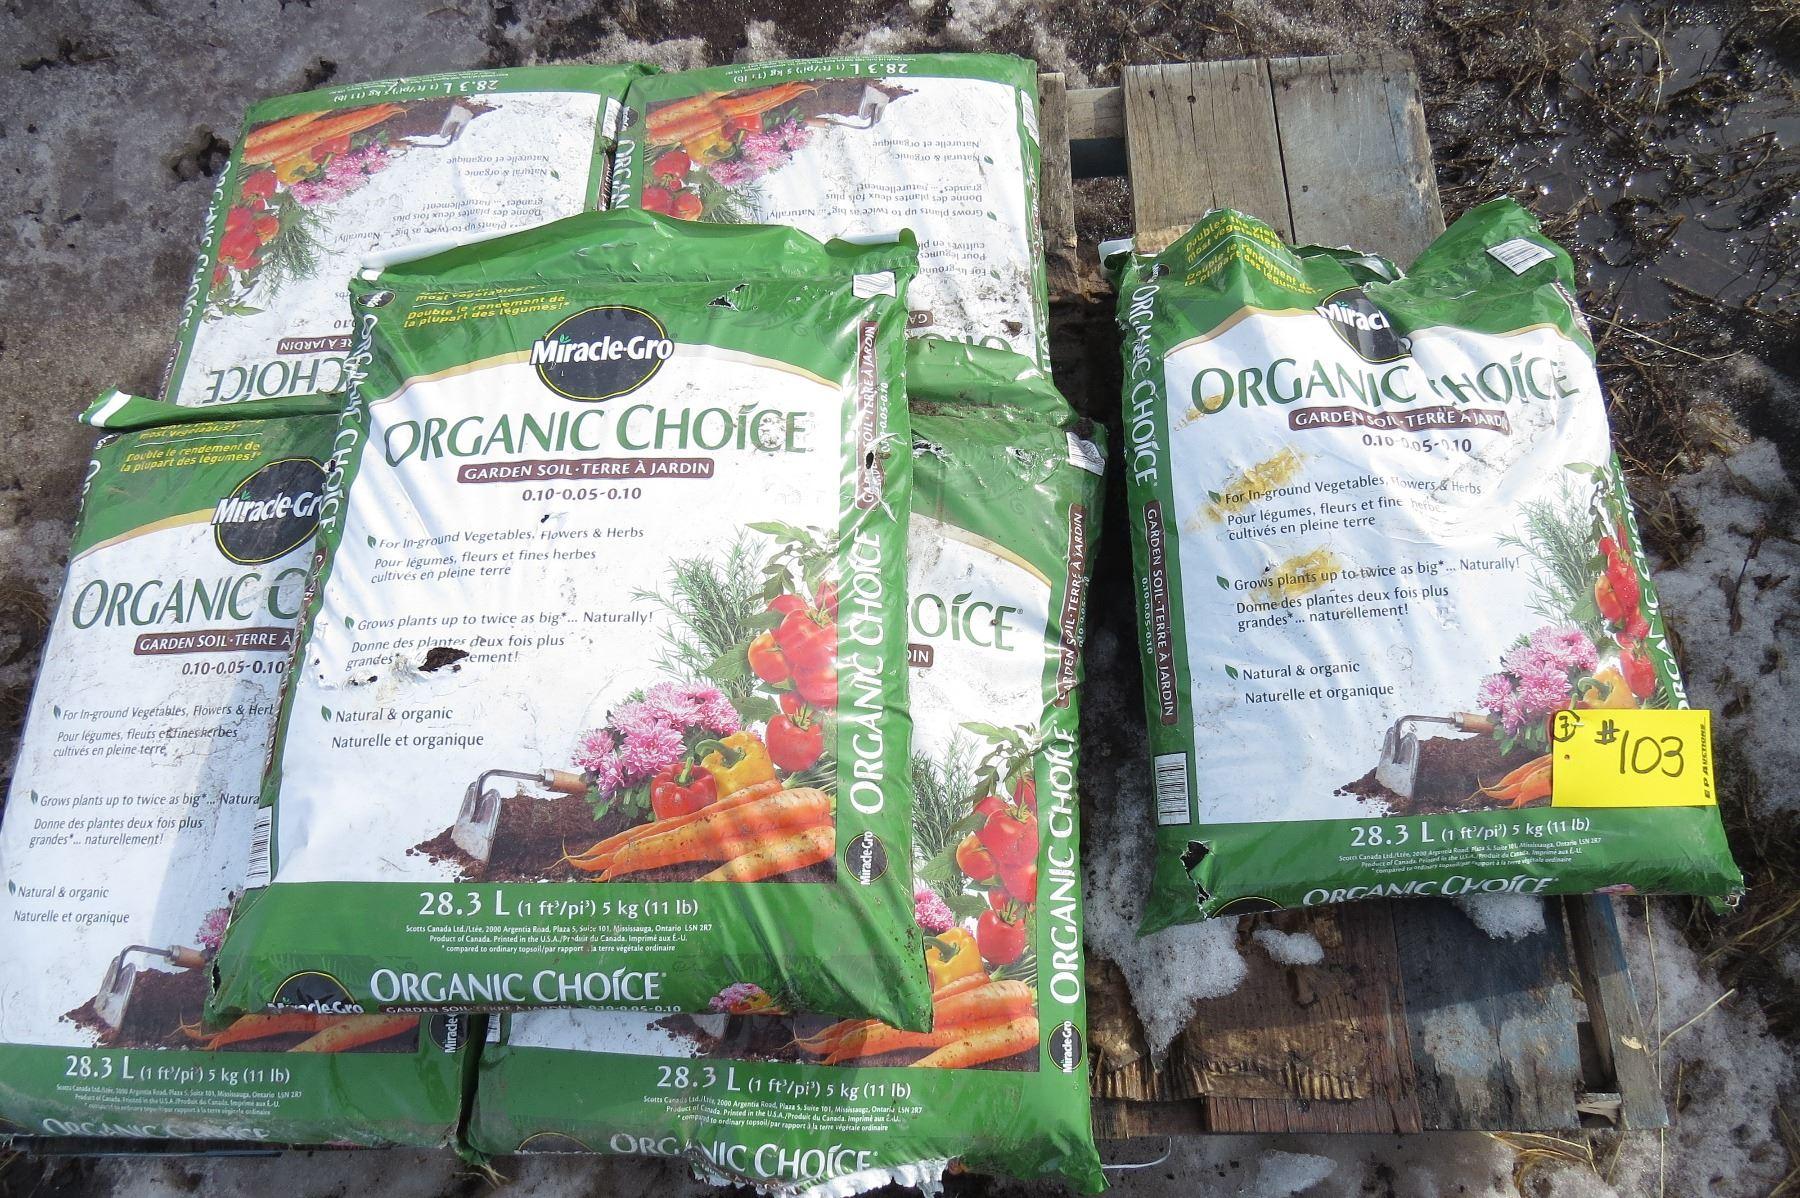 Image 1 Pallet Of Miracle Gro Organic Choice Garden Soil